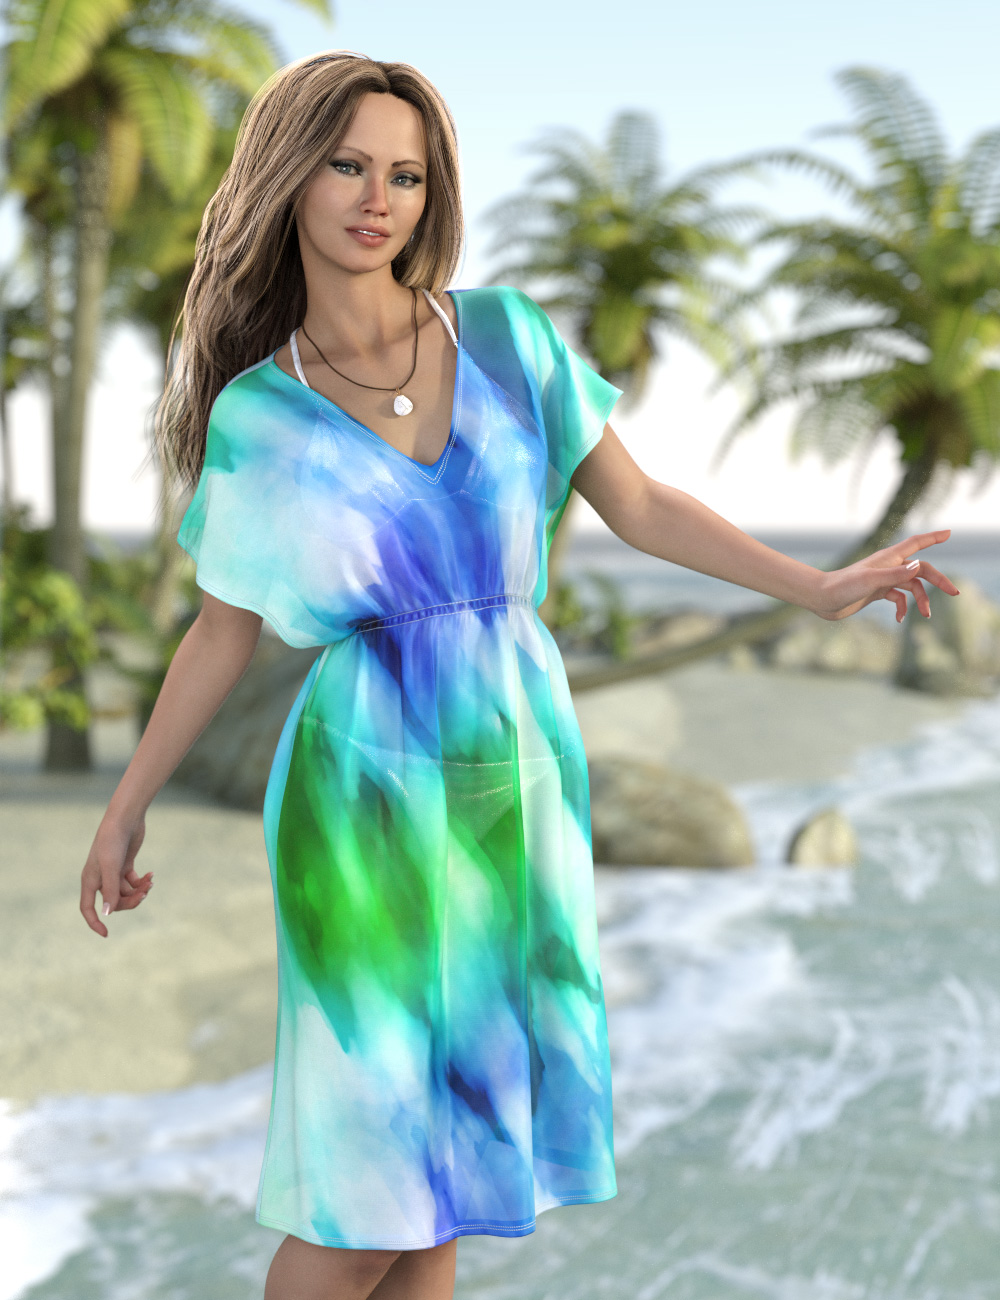 Beach Caftan for Genesis 8 and 8.1 Females by: esha, 3D Models by Daz 3D